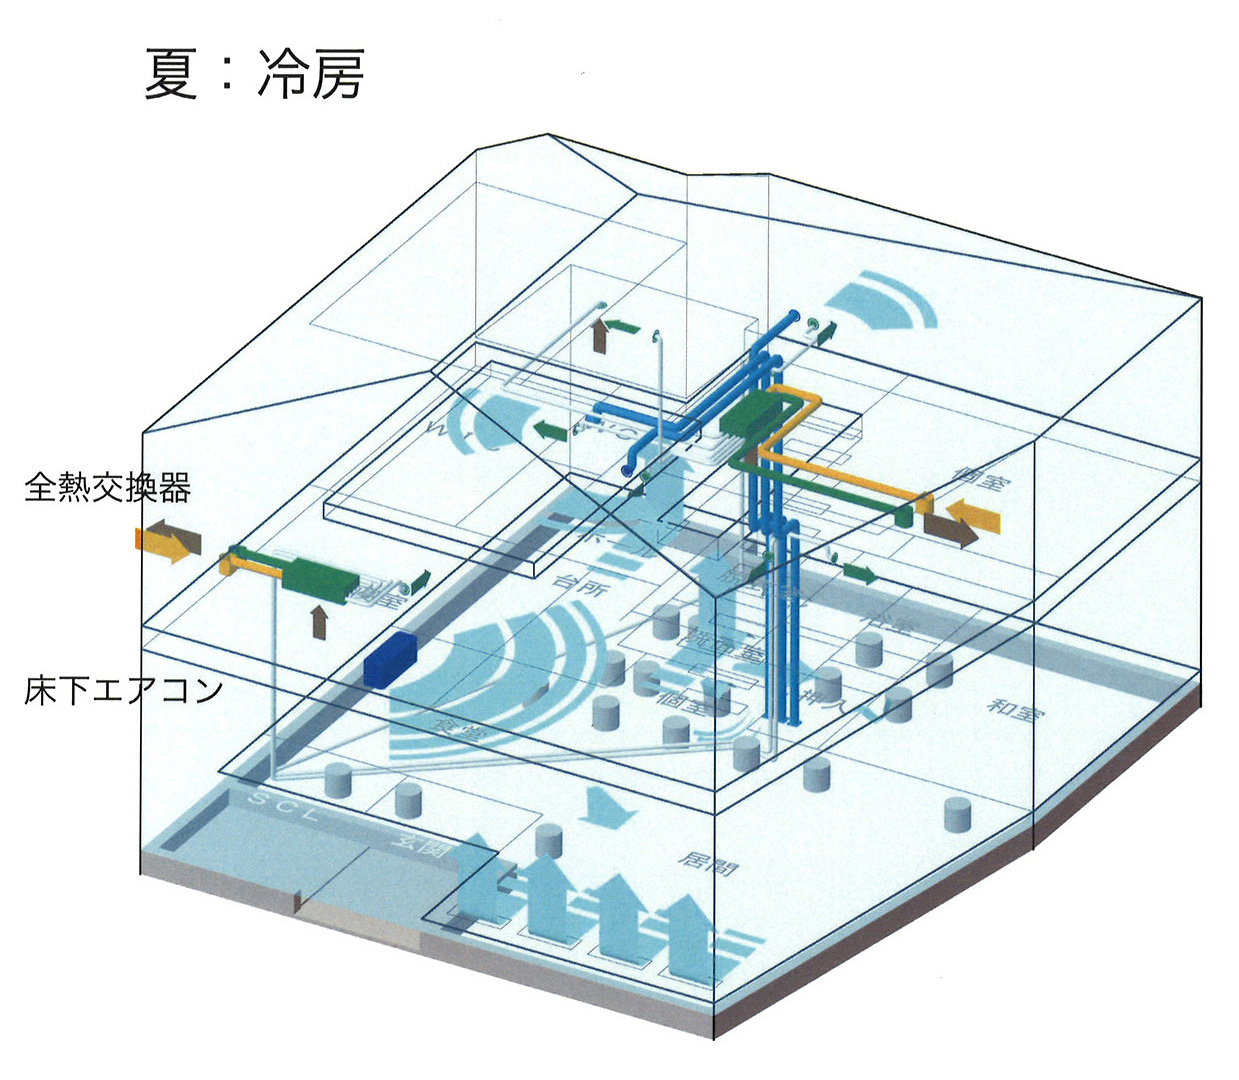 Q1住宅祐天寺:完成写真4 床下エアコン冷暖房簡単システム 2_e0054299_14532667.jpg